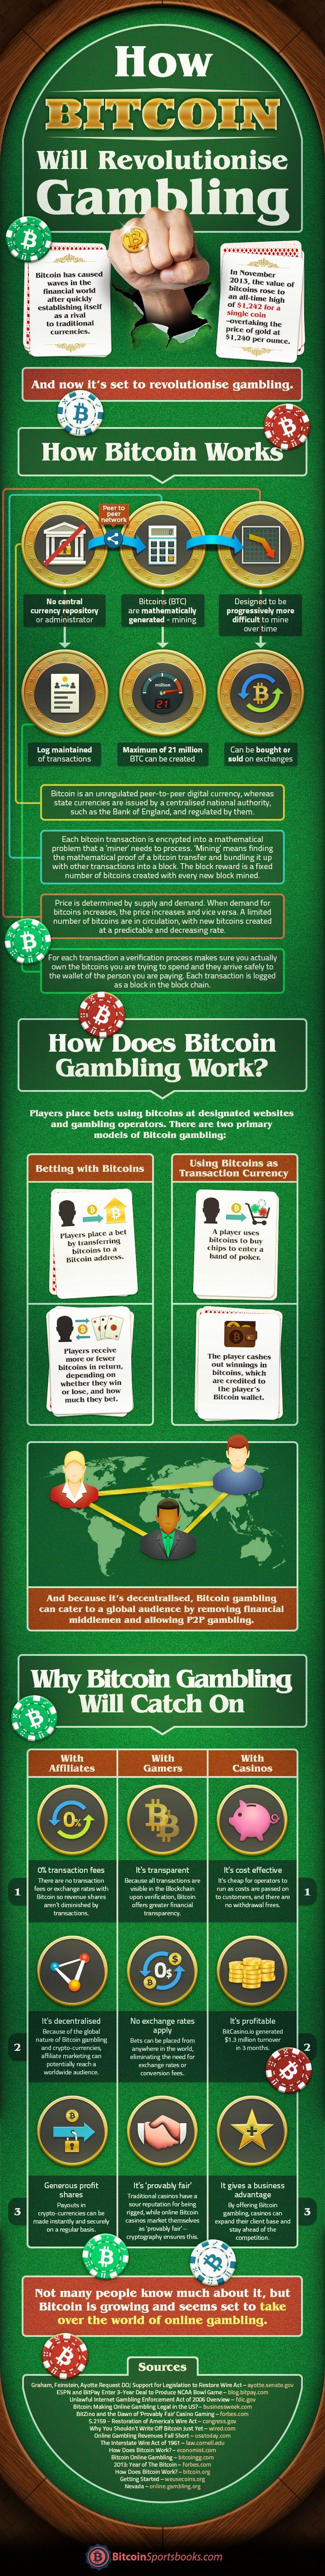 How Bitcoin Will Revolutionize Gambling [Infographic]